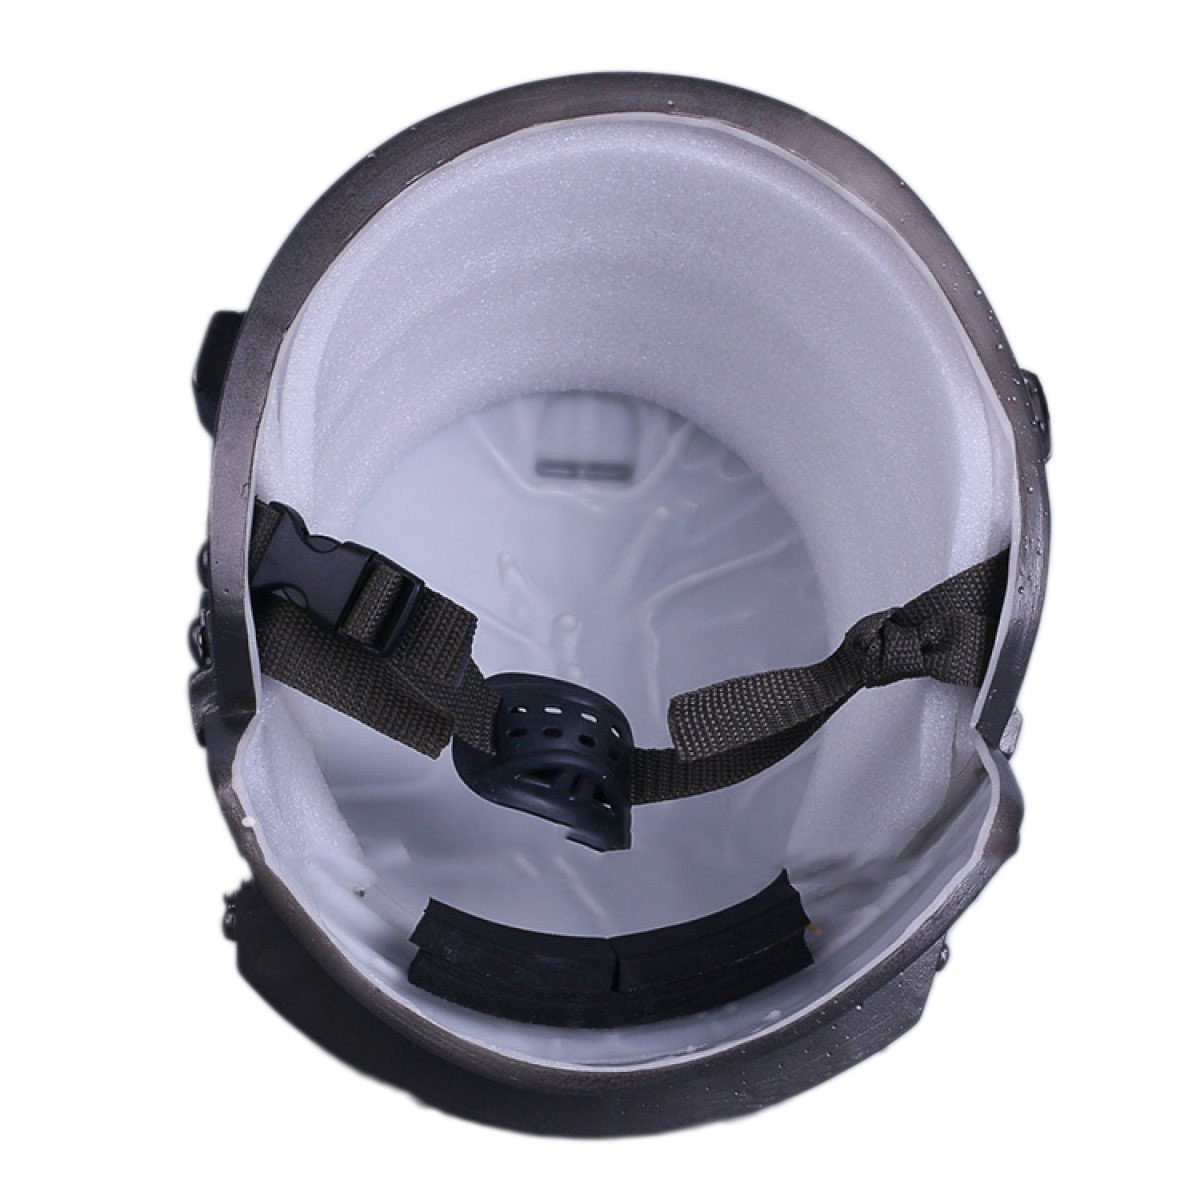 Jedi Survival Battle Royale Huhn Cos Helme Helme Helme Level 3 Helm Halloween Spiele Zeigt Requisiten Masken,A-OneGröße ae8ec7